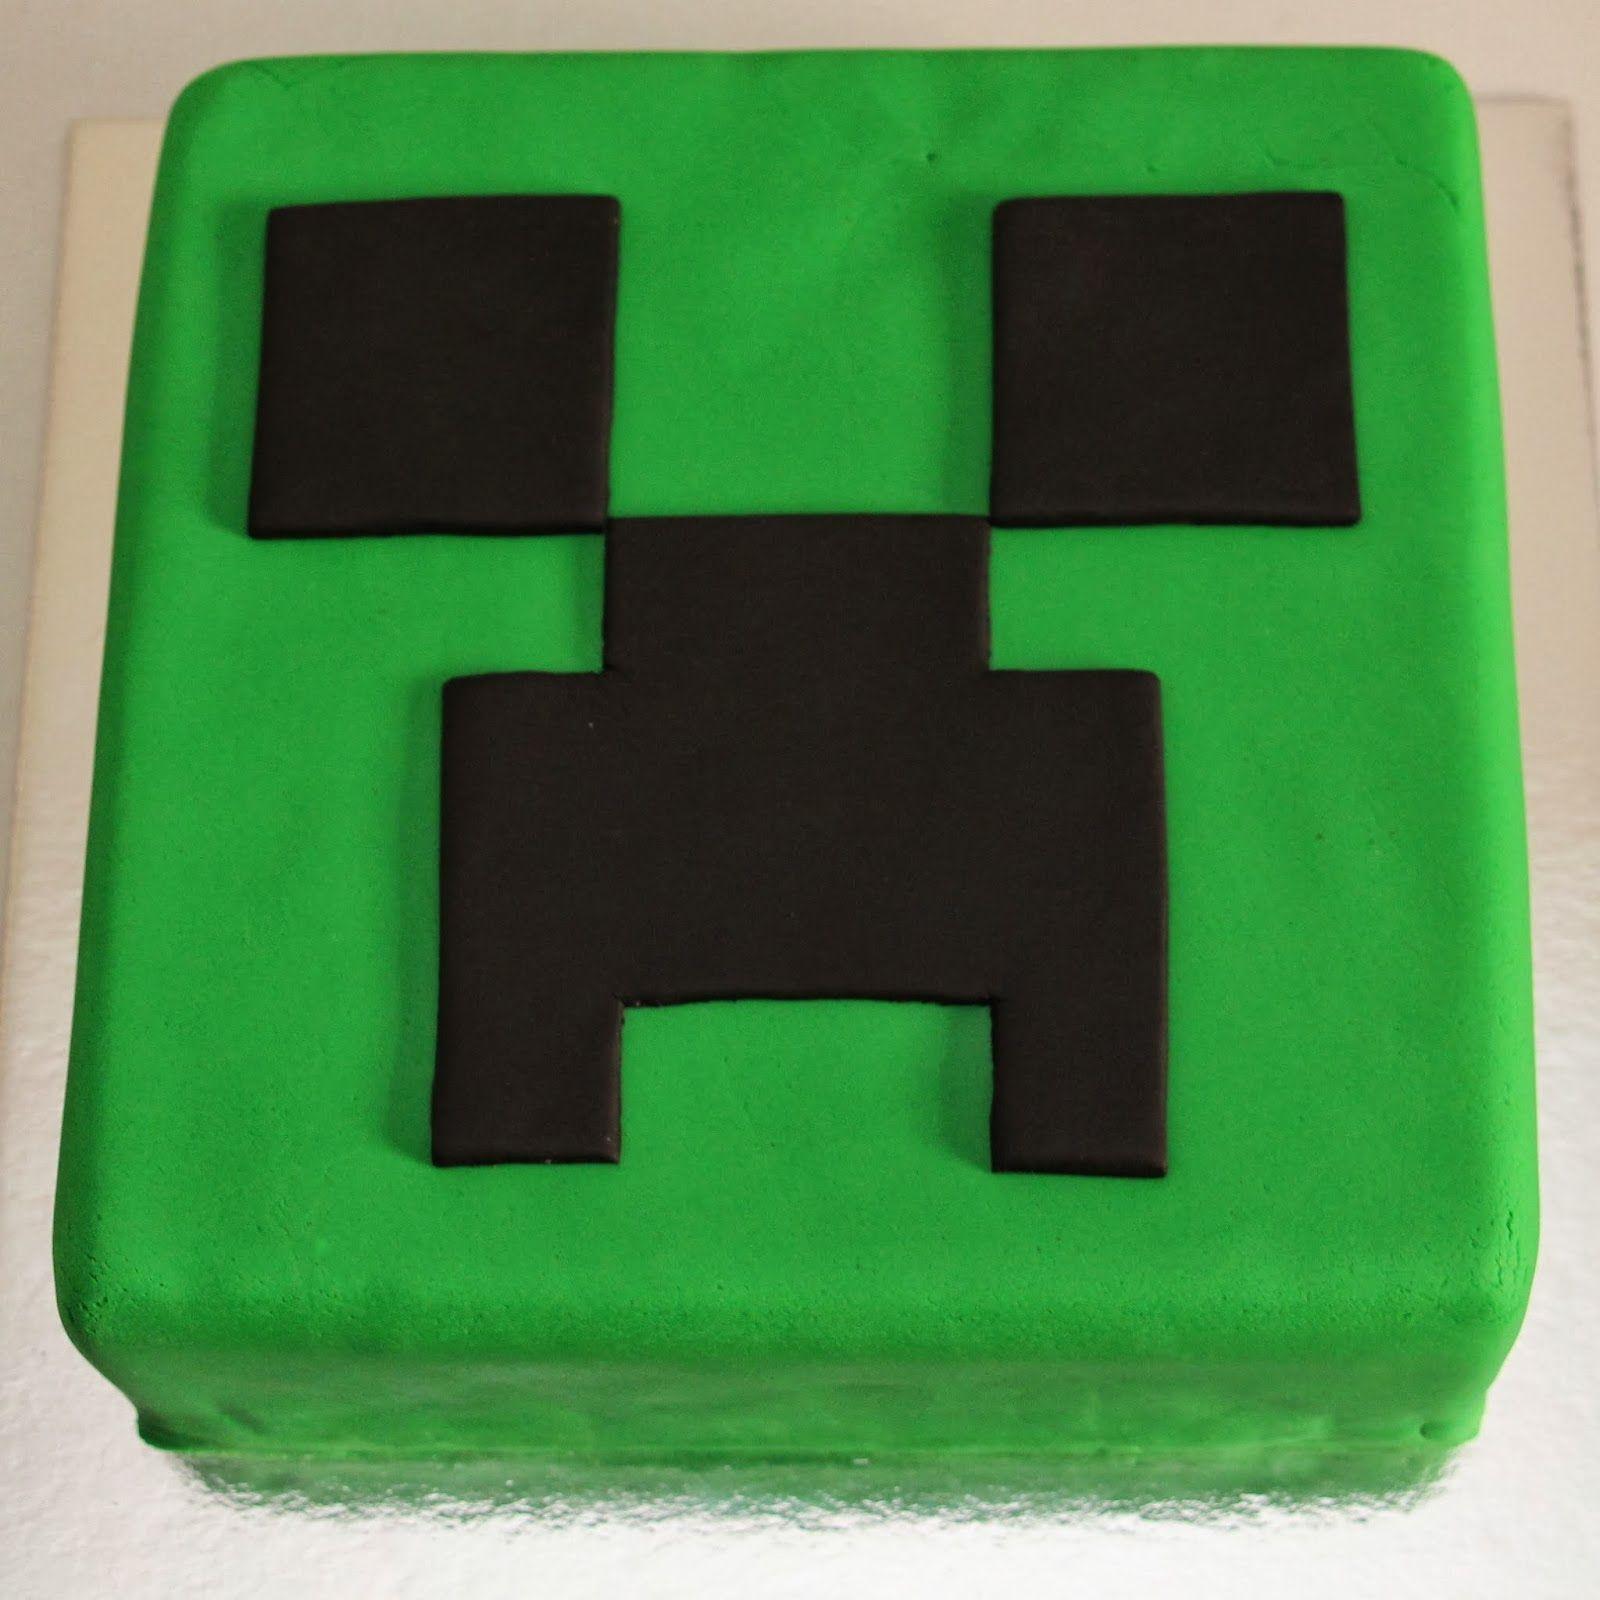 Pleasant Feeling A Bit Creeper Y Minecraft Birthday Cake Creeper Cake Personalised Birthday Cards Paralily Jamesorg